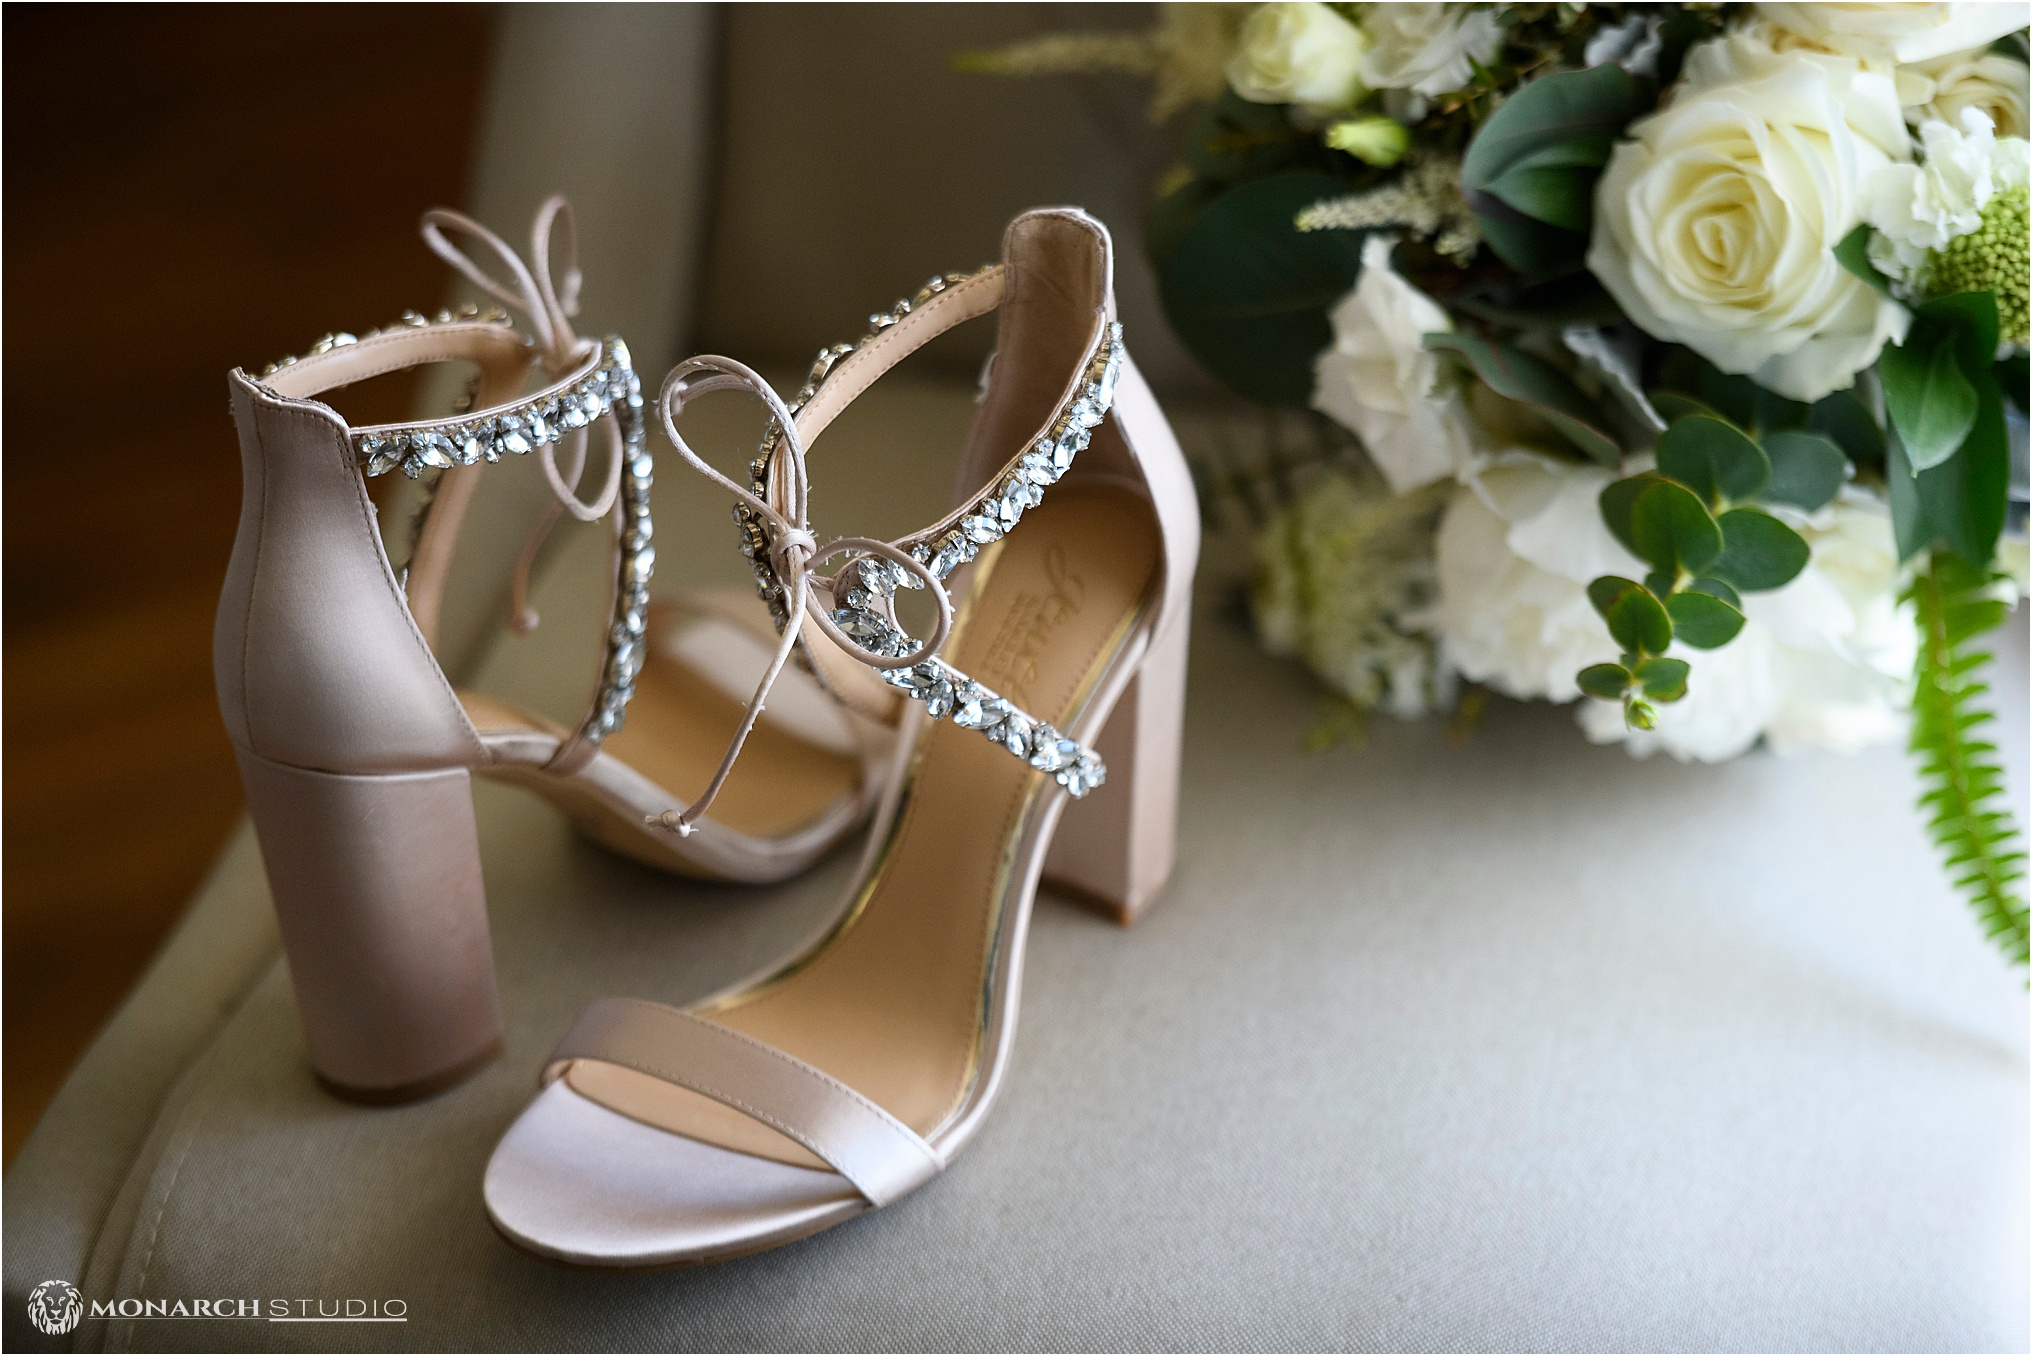 026-whiteroom-wedding-photographer-2019-05-22_0008.jpg